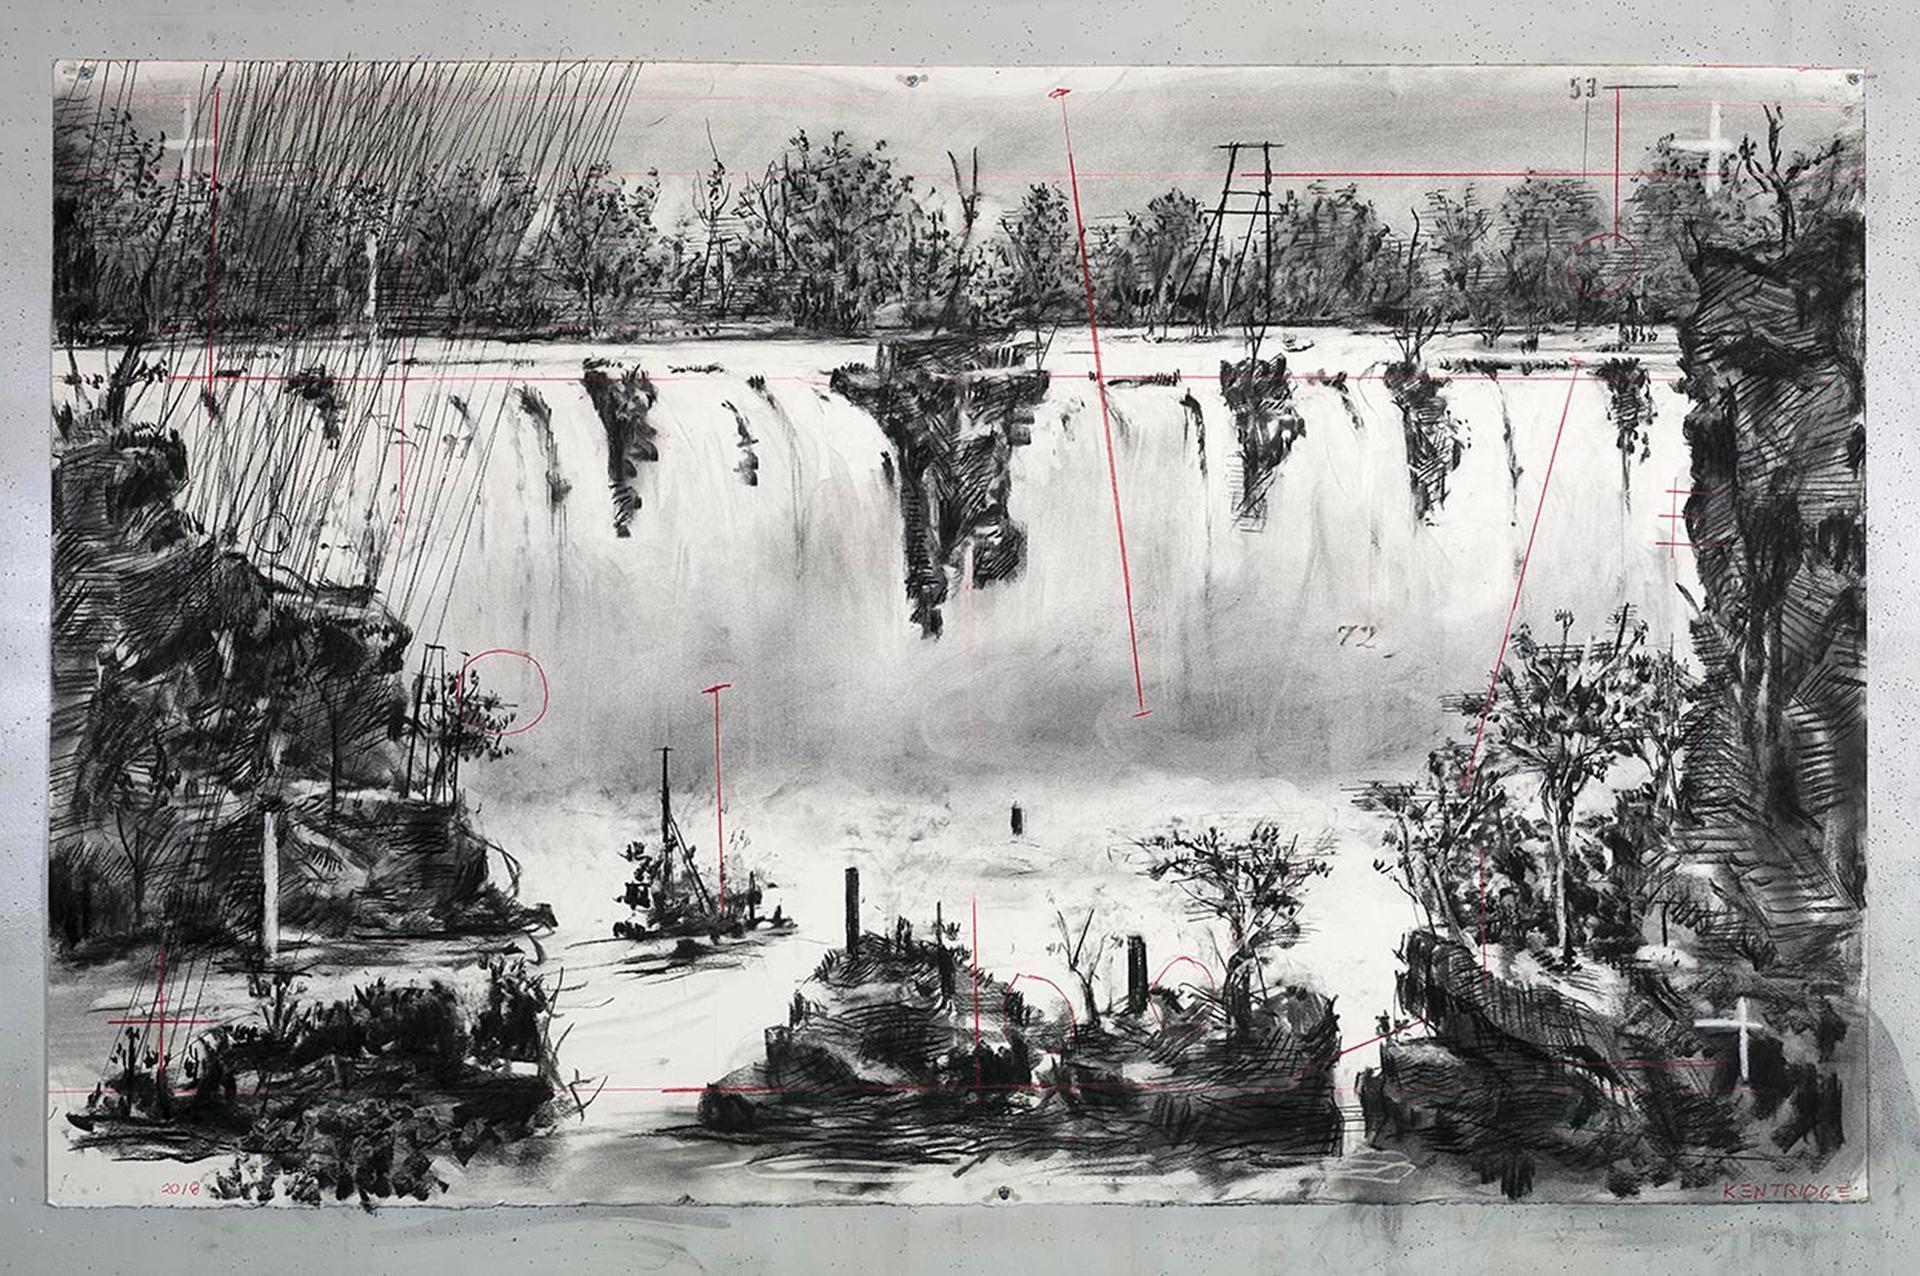 William Kentridge's latest project The Pool Ahead (2018) William Kentridge. Courtesy of the artist and Marian Goodman Gallery